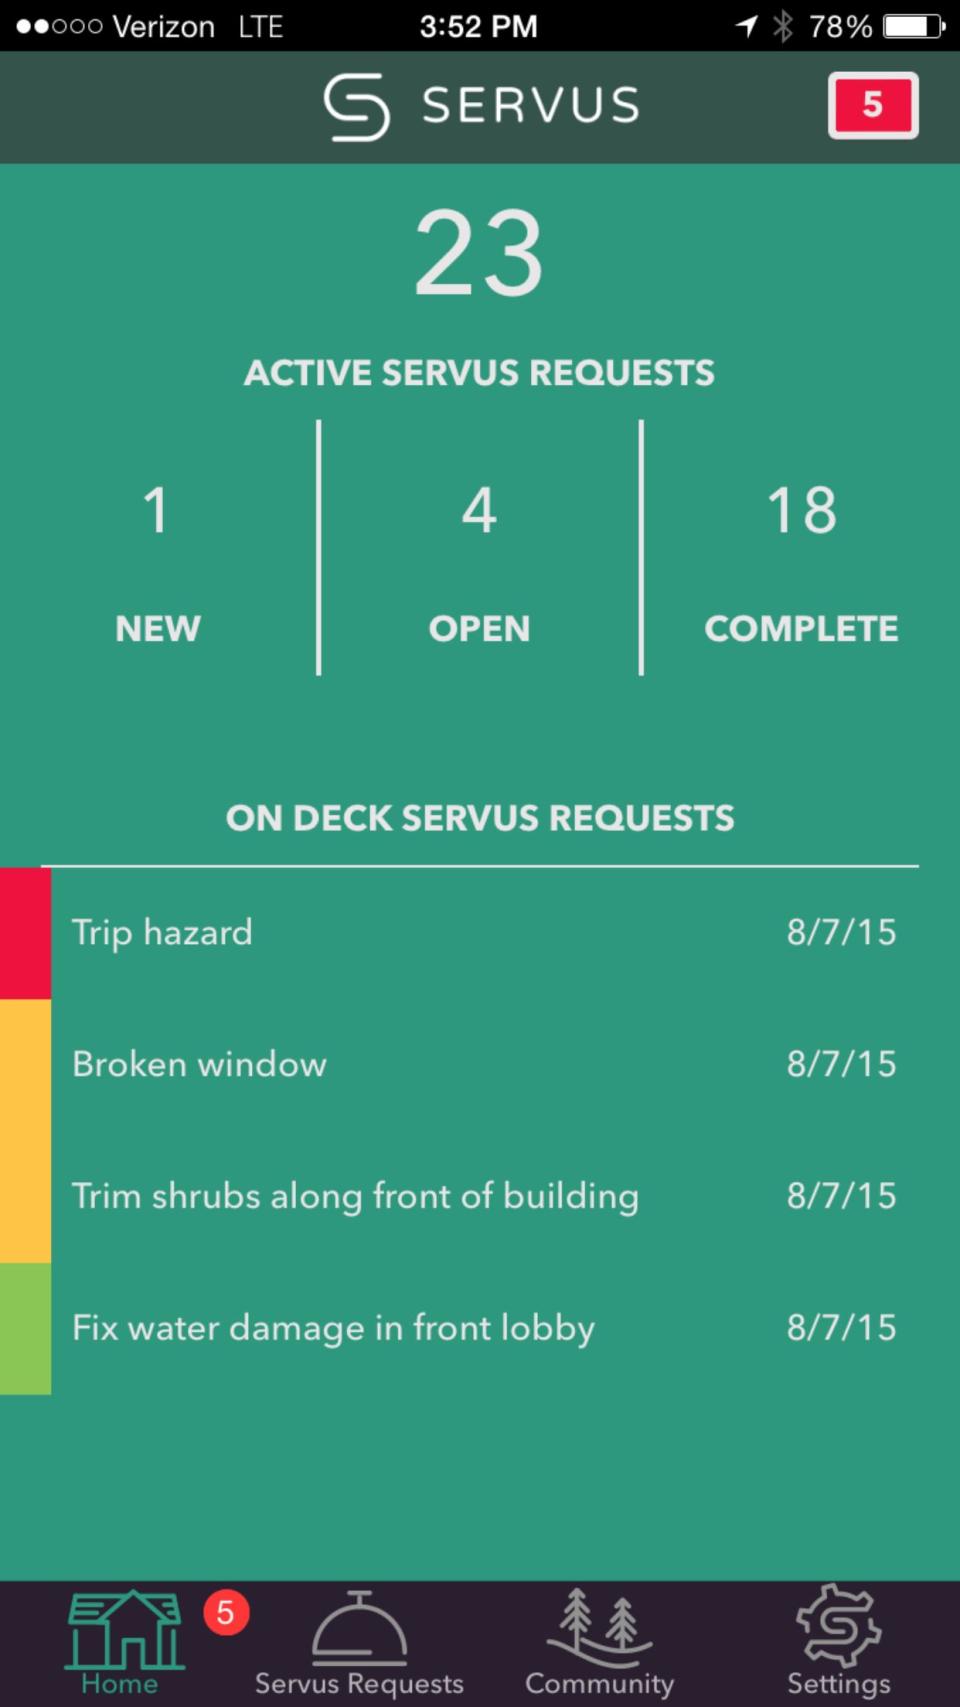 Servus maintenance request